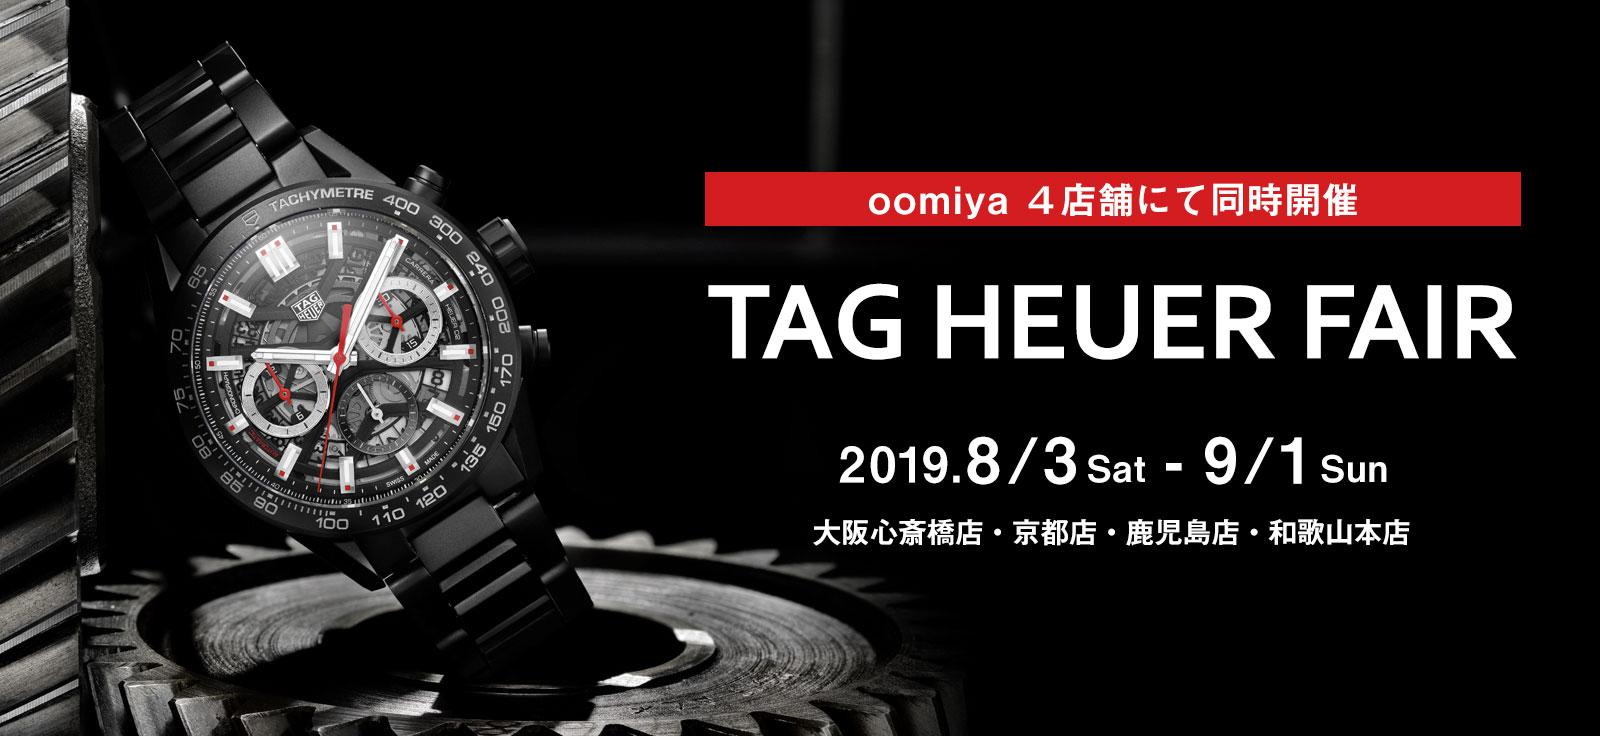 TAG HEUER FAIR[タグ・ホイヤー フェア]|oomiya4店舗同時開催